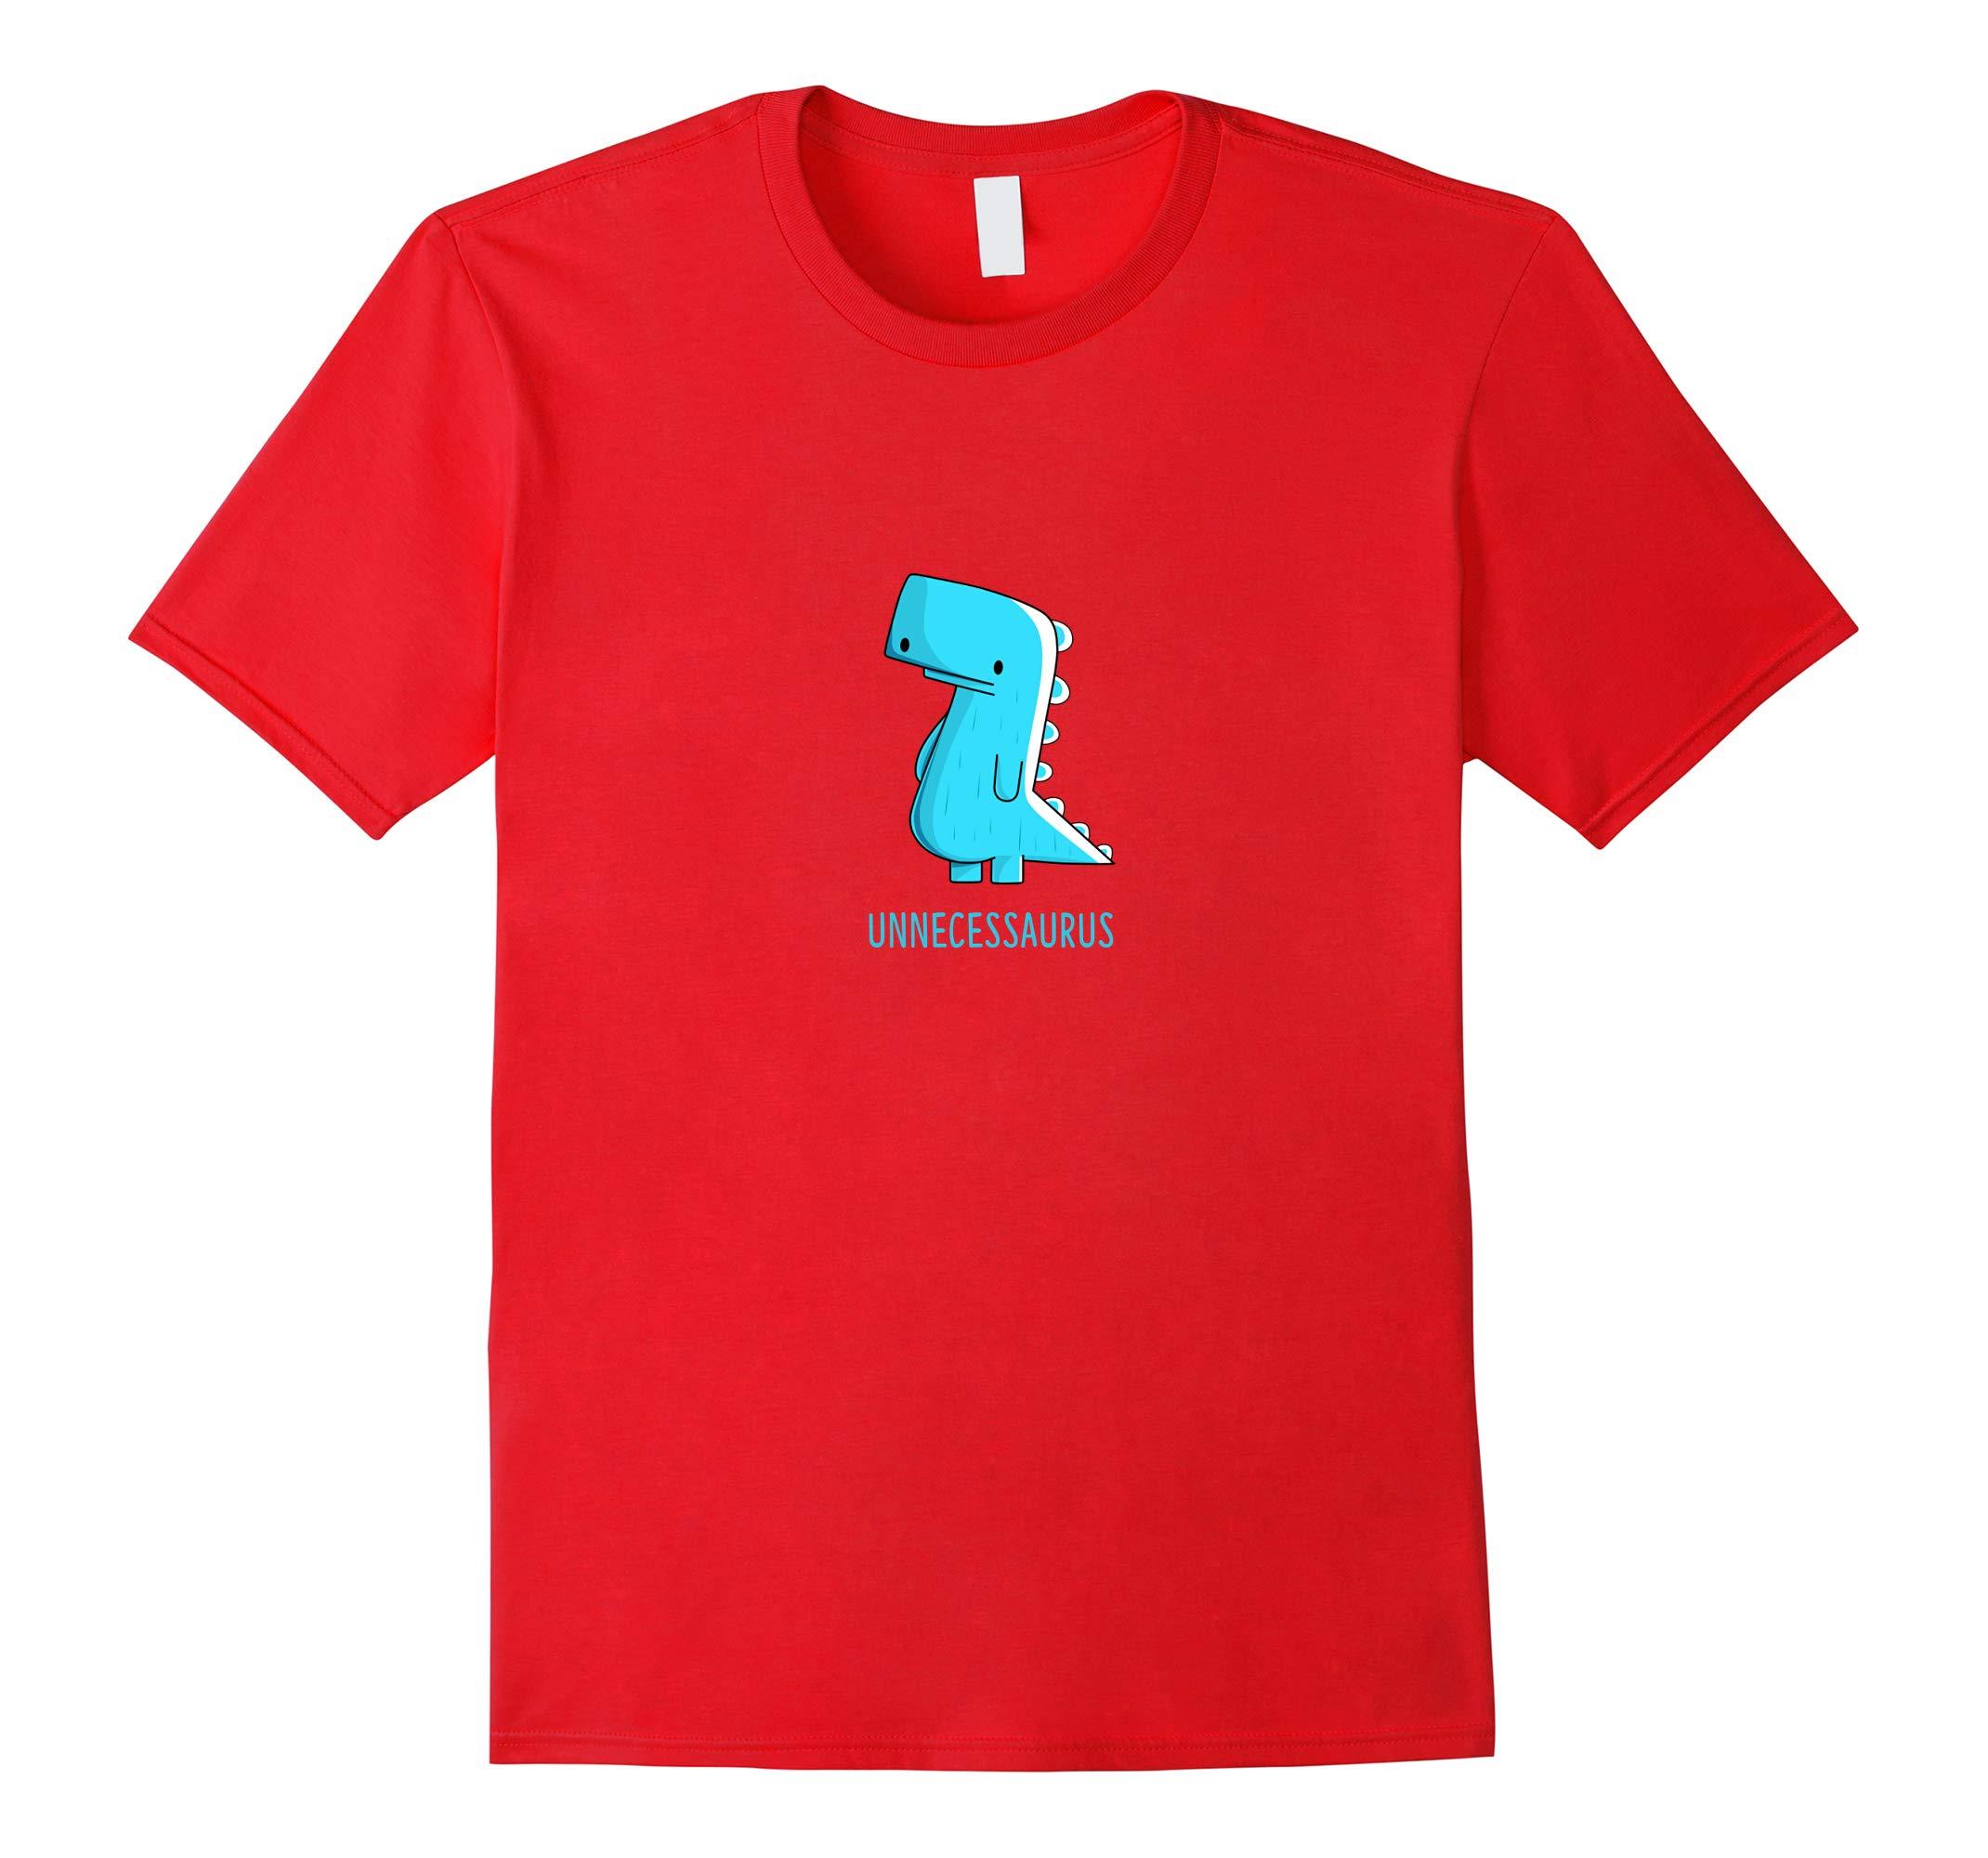 Unnecessaurus Dinosaur Cartoon T-shirt-RT